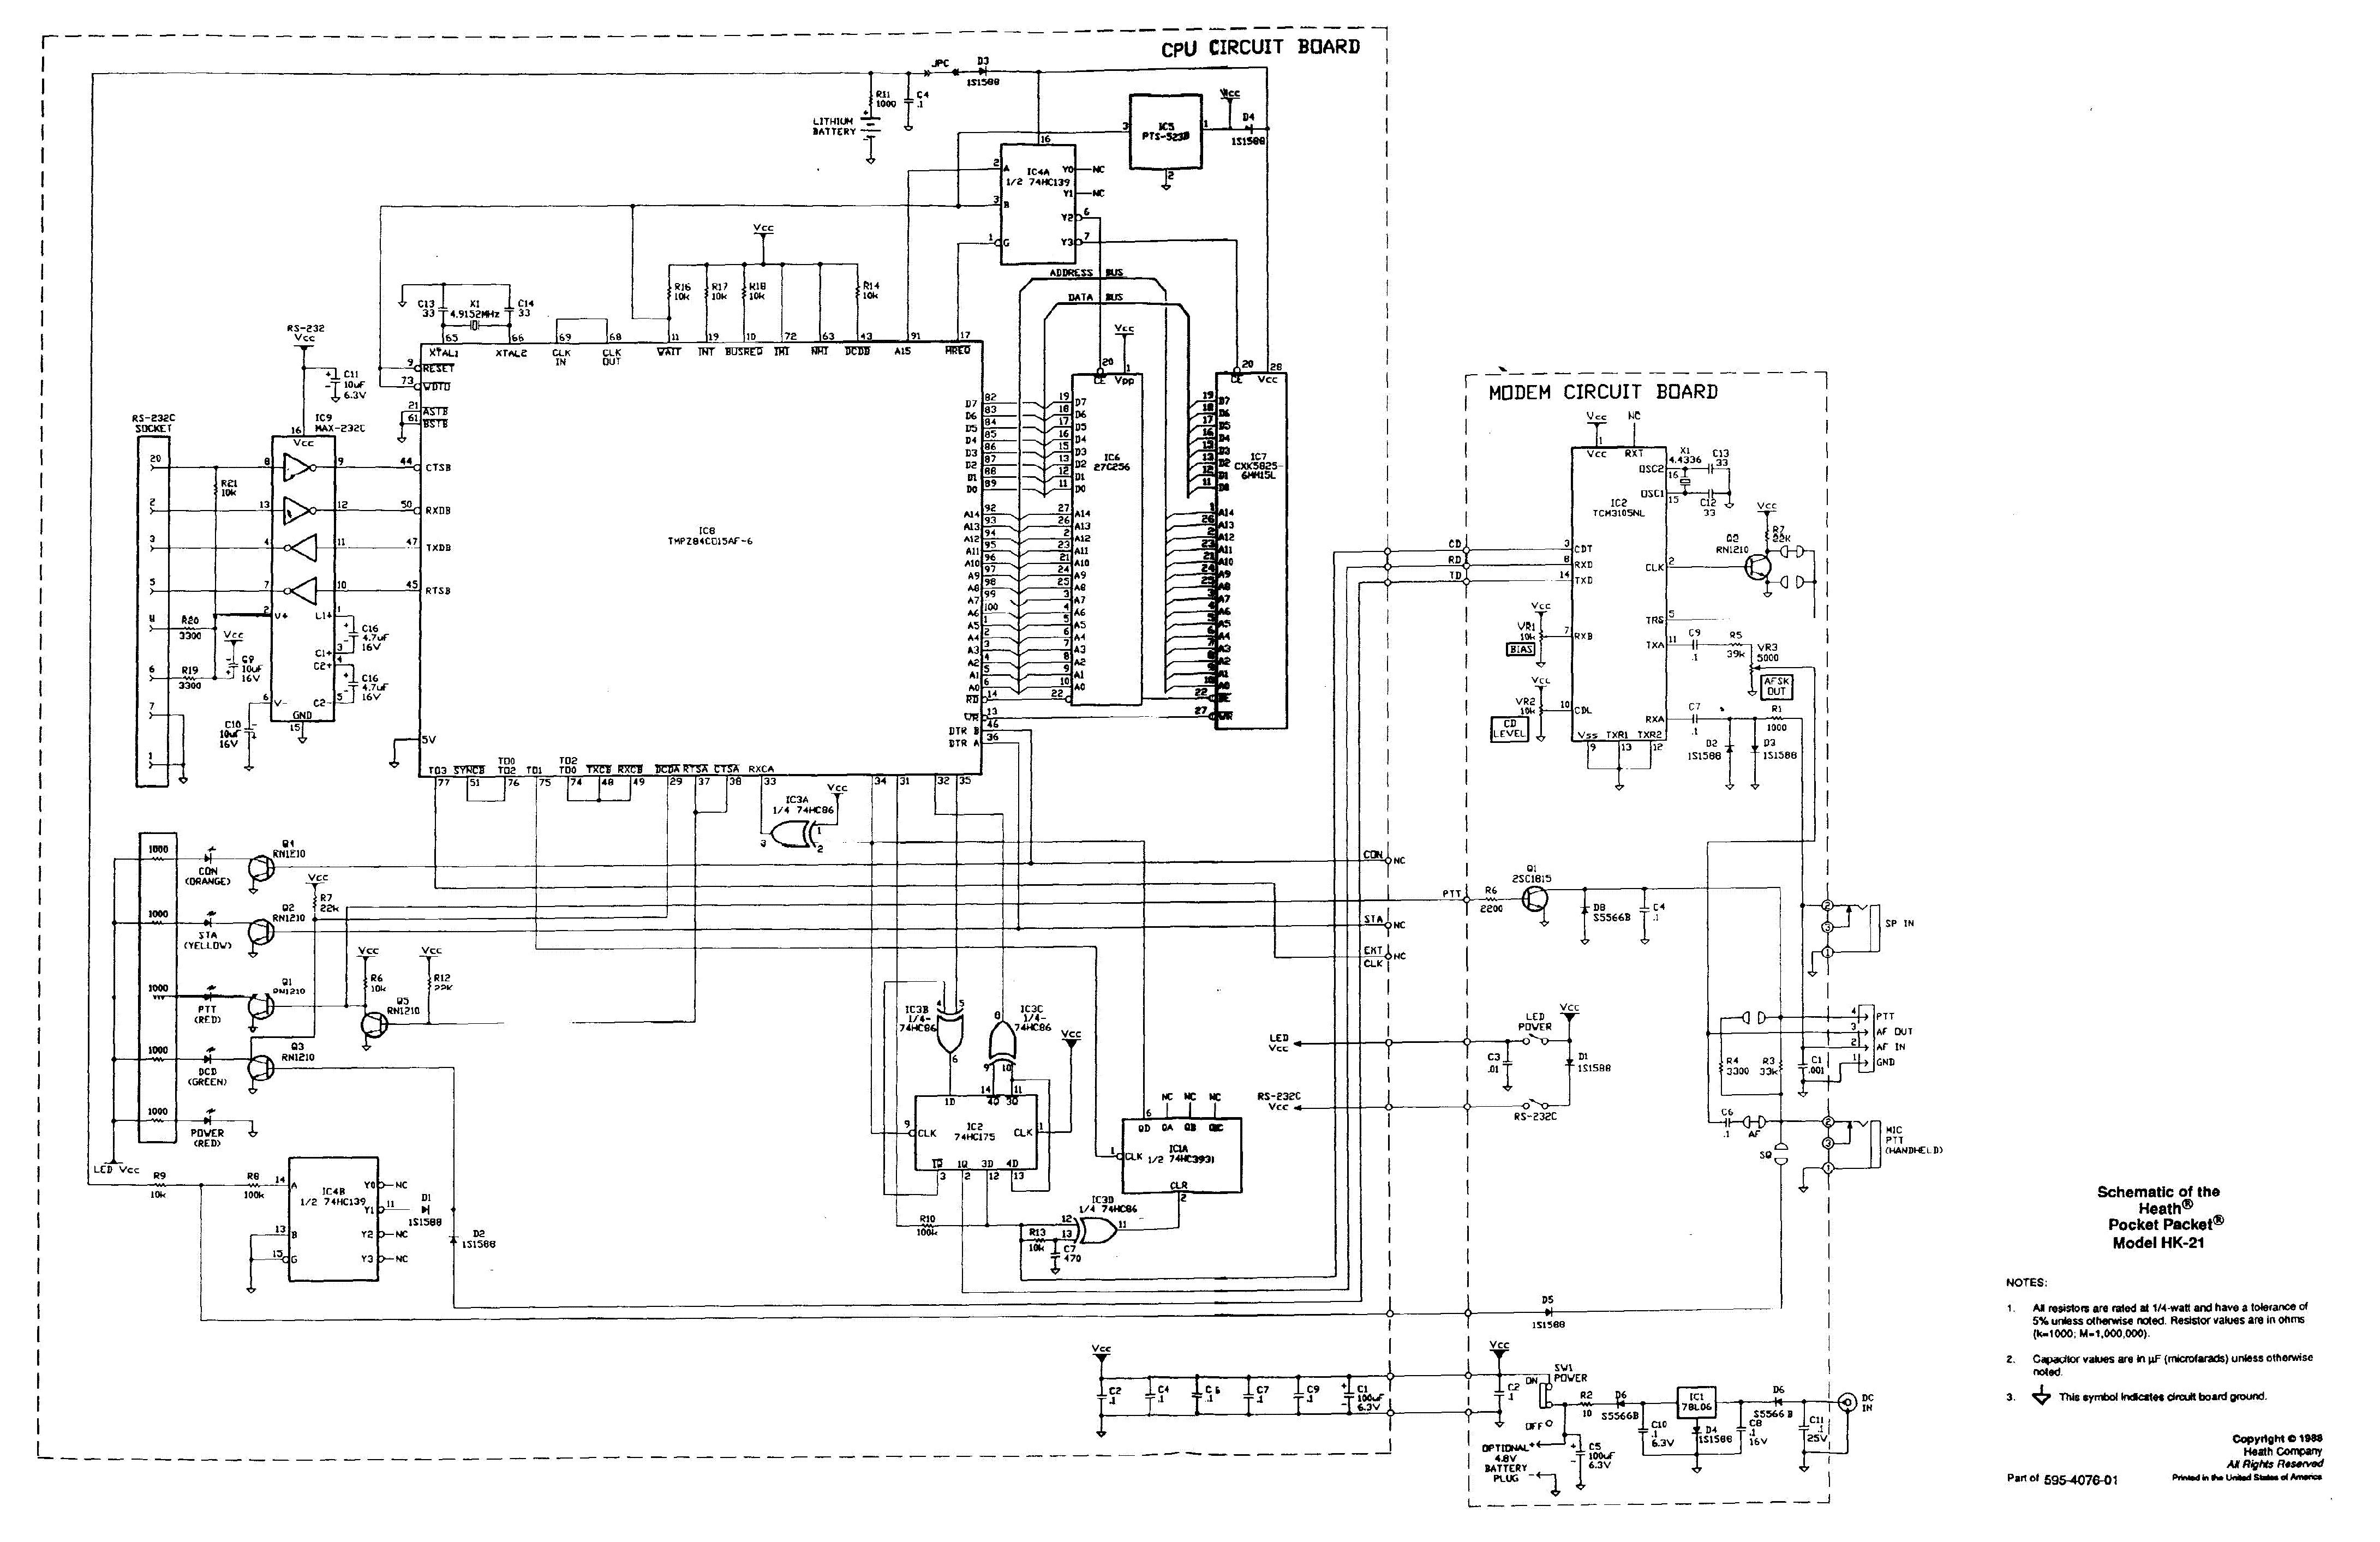 medium resolution of dx 40 schematic wiring diagram article review mix 1kva inverter circuit diagram manual new heathkit dx